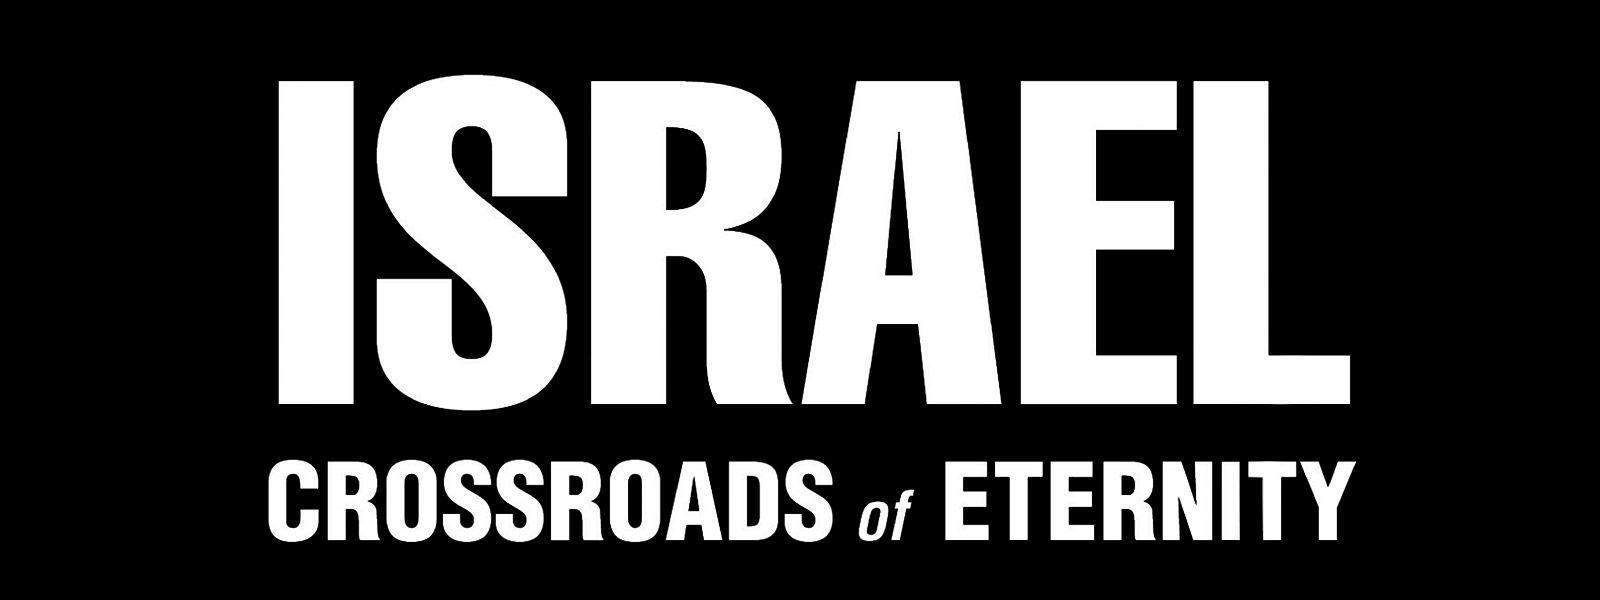 Rightnow Media Streaming Video Bible Study Israel Crossroads